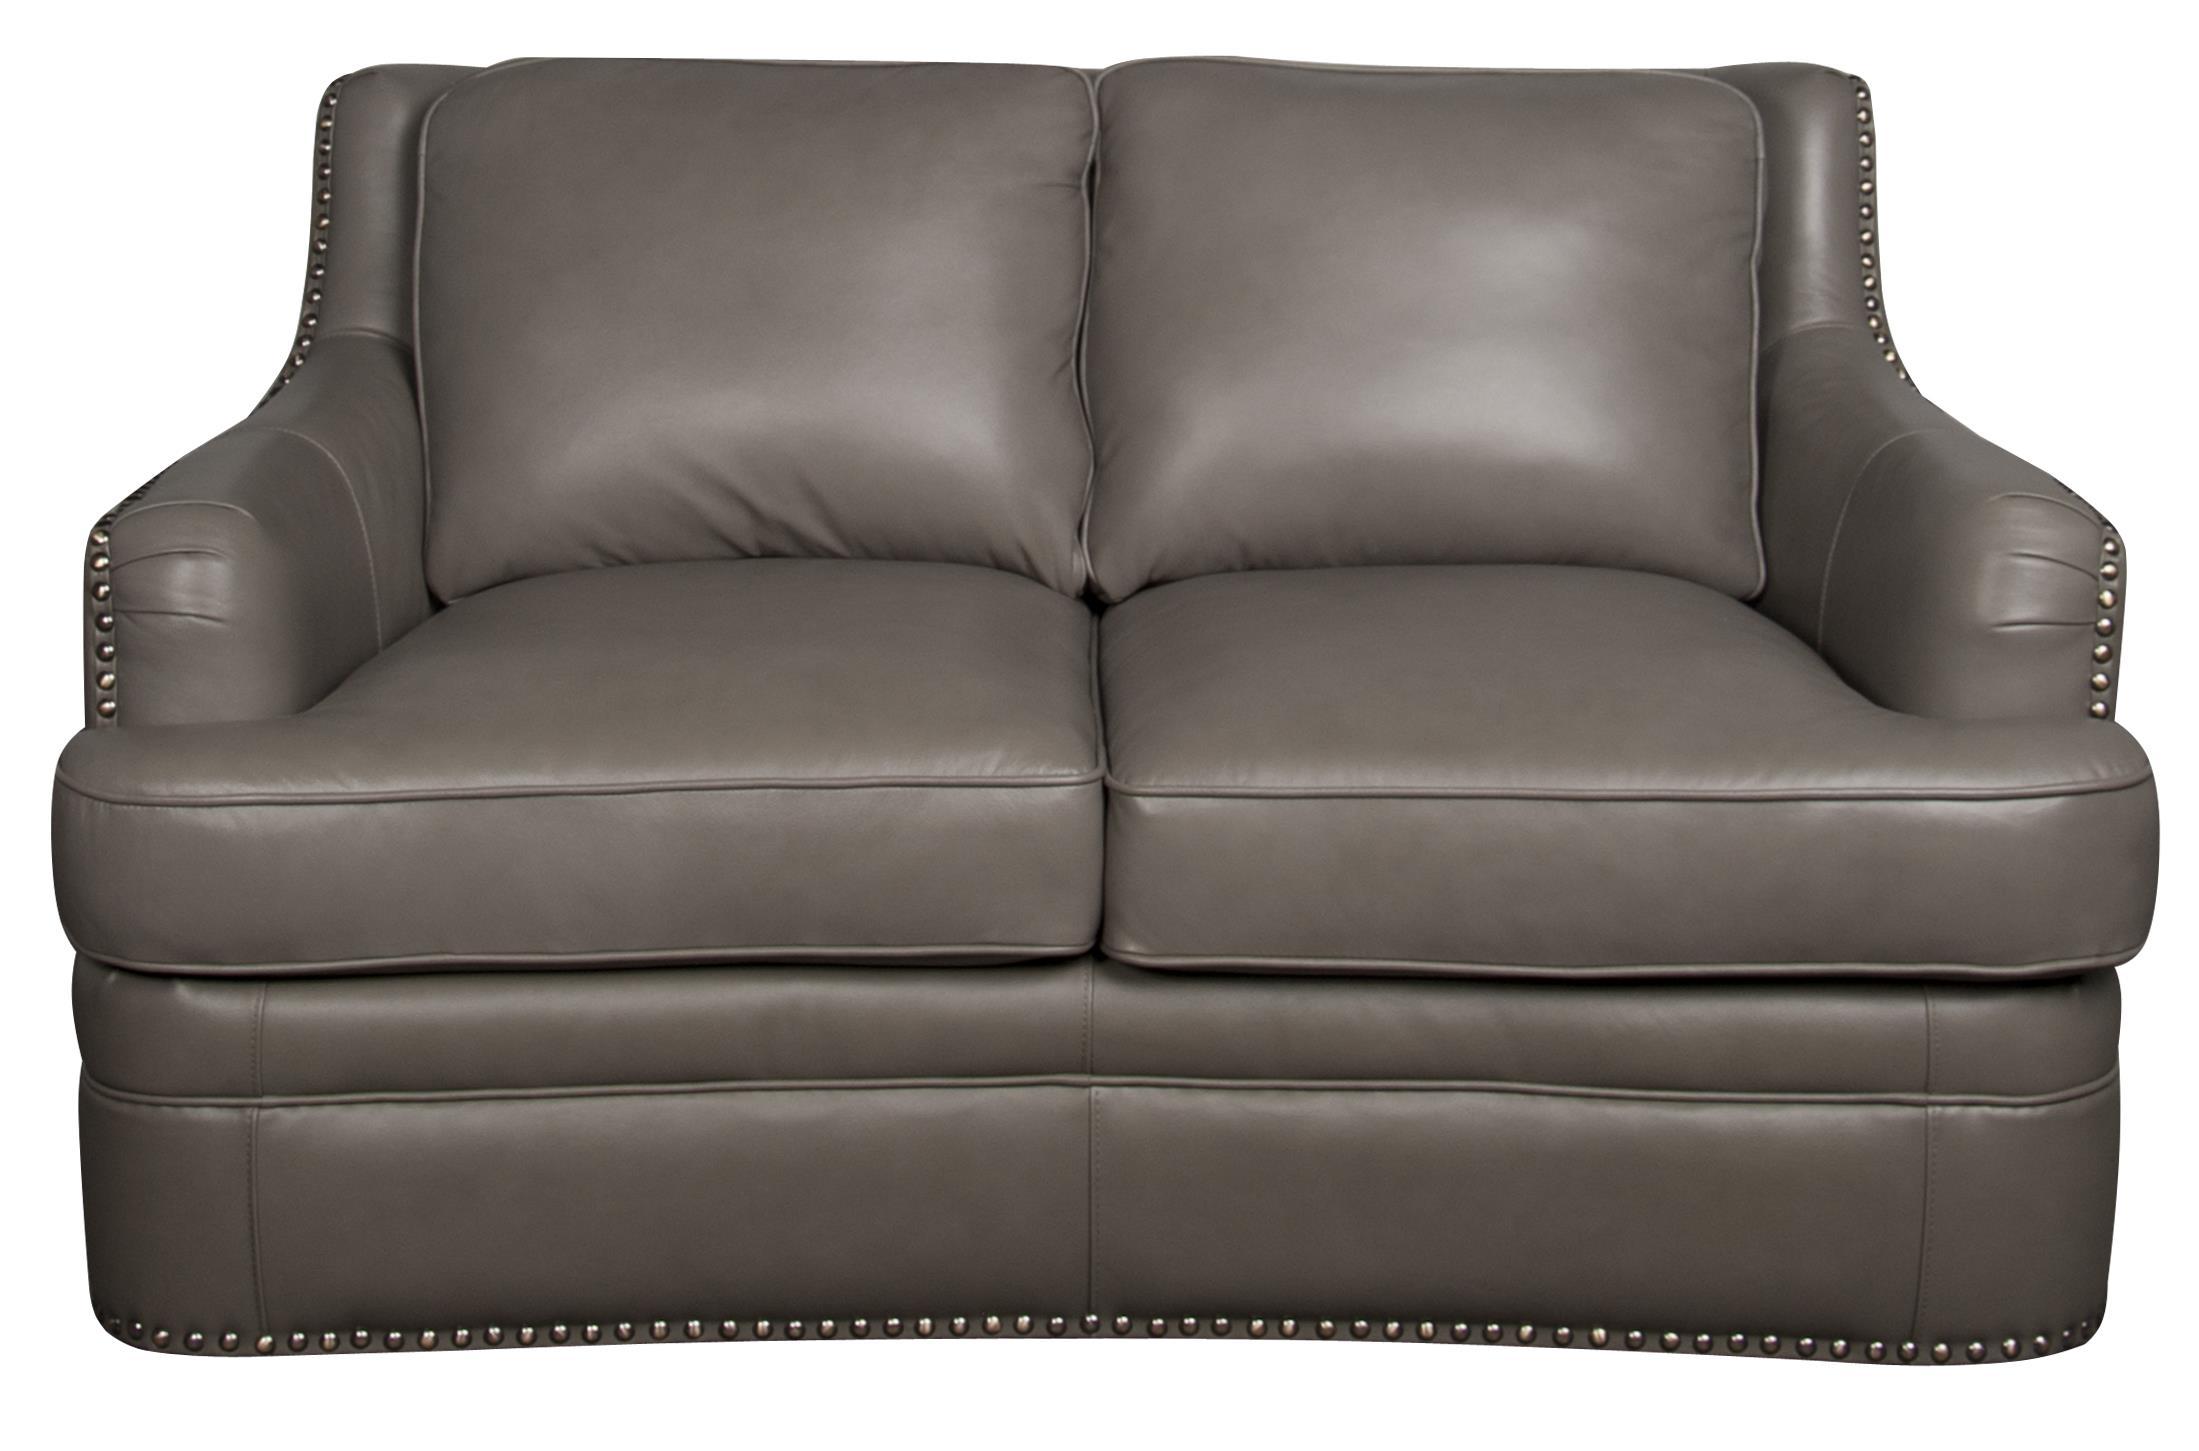 Morris Home Furnishings Maya Maya 100% Leather Loveseat - Item Number: 316165523